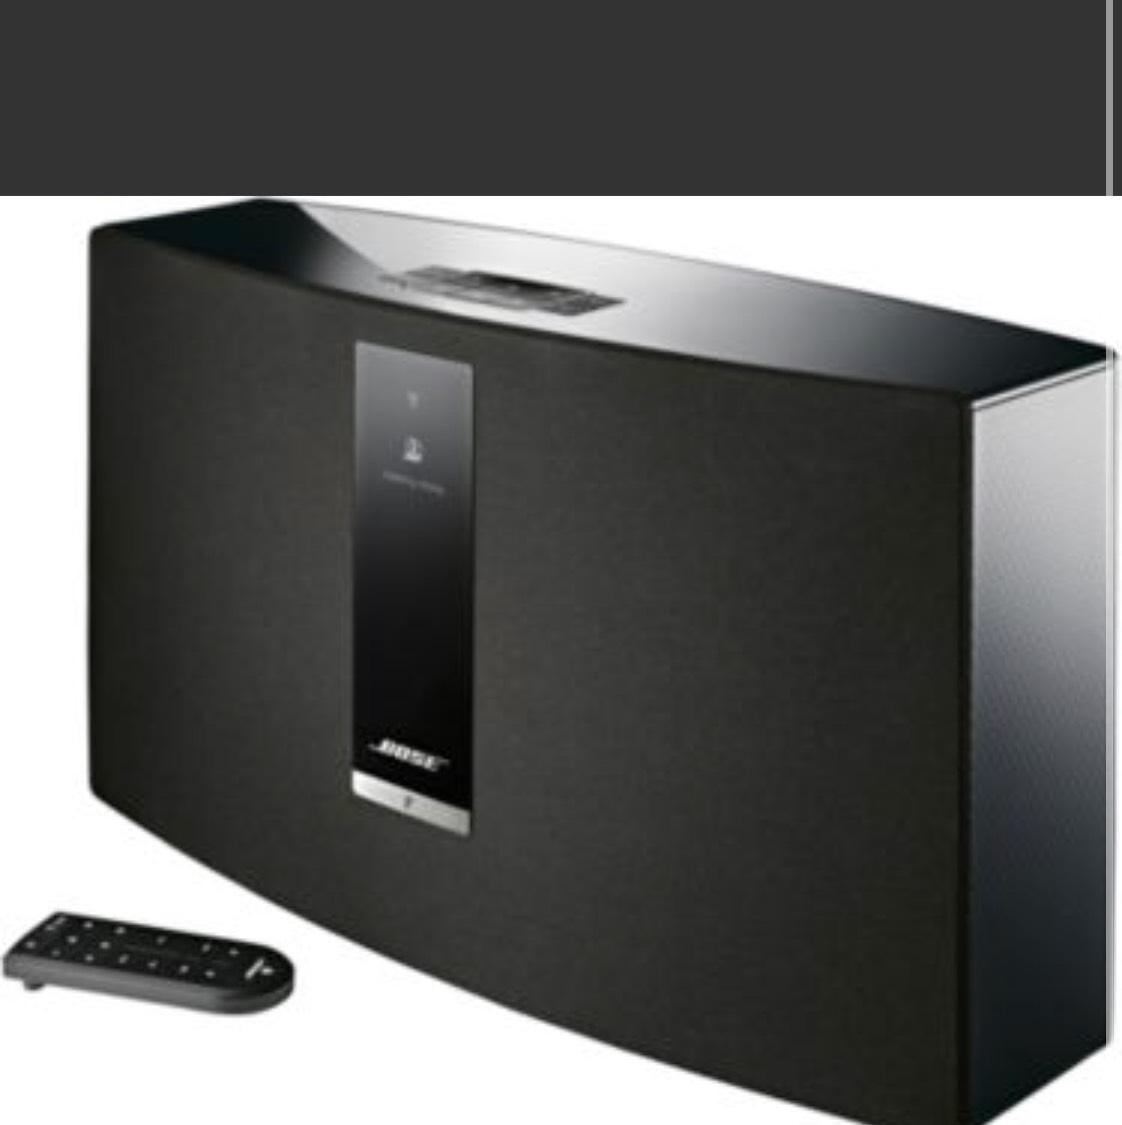 Enceinte Multiroom Bose Soundtouch 30 III - Noir